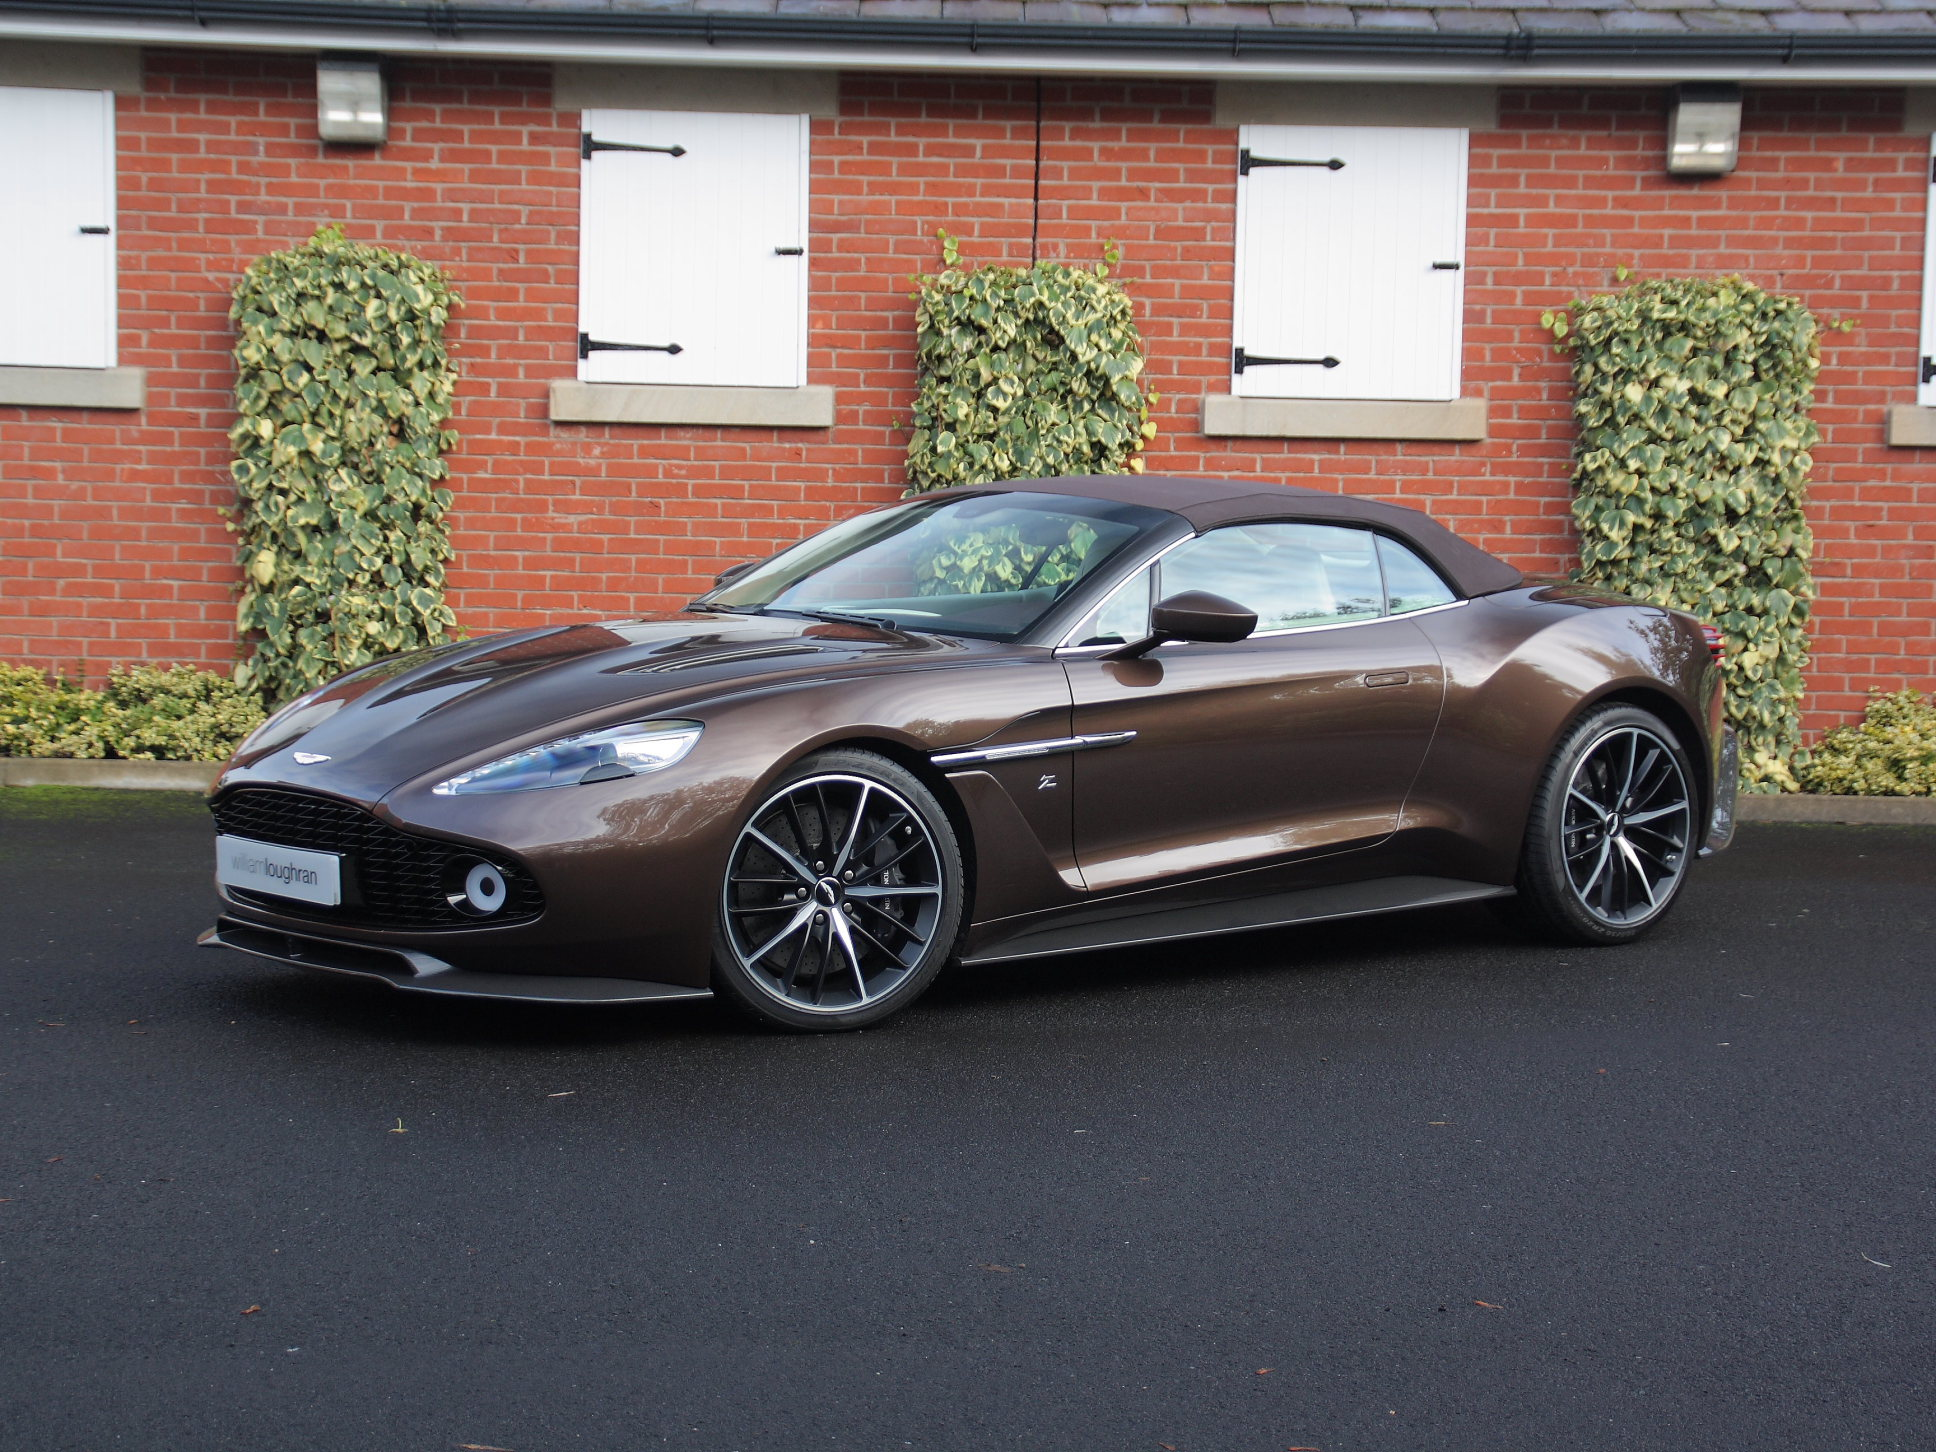 Aston Martin Vanquish Zagato Volante Number 69 Of 99